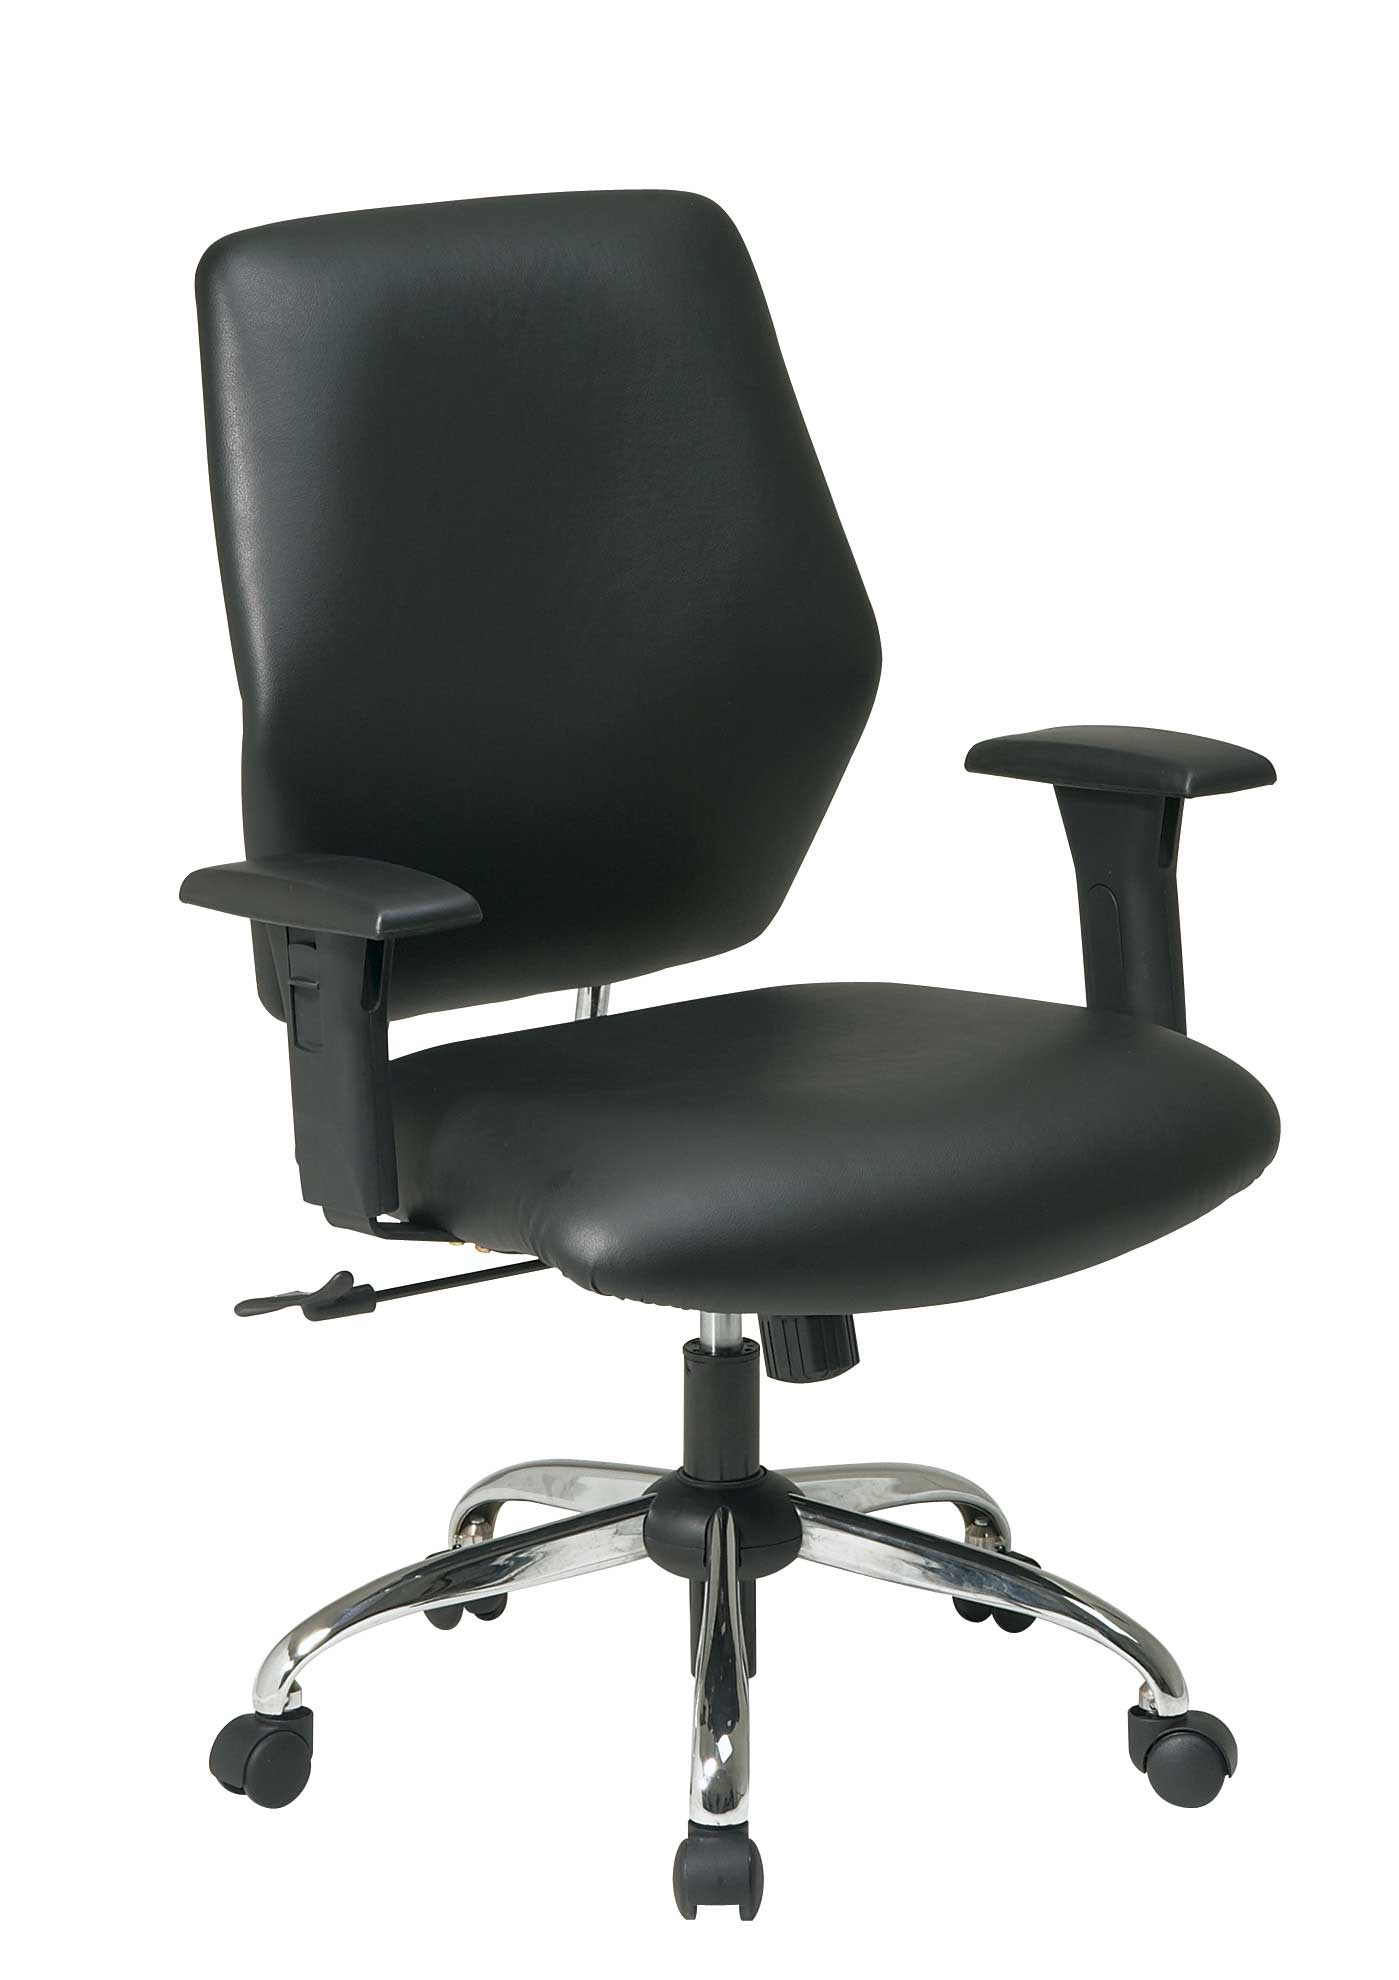 office chair desk.